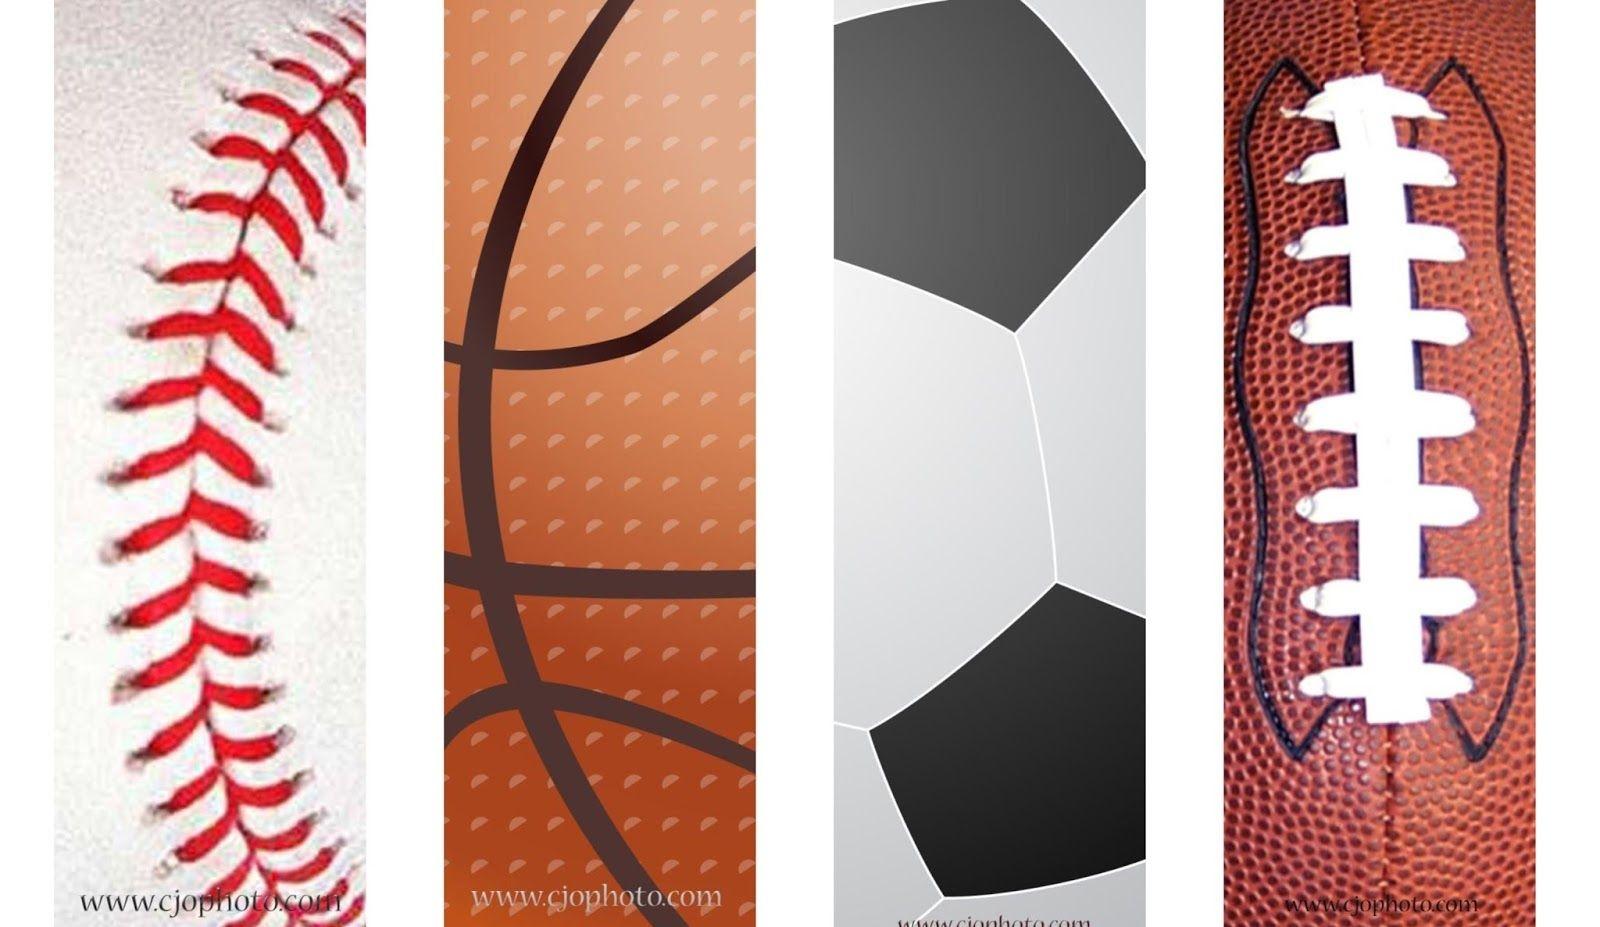 Printable Bookmarks: Sports   Free Printable Bookmarks   Bookmarks - Free Printable Sports Bookmarks